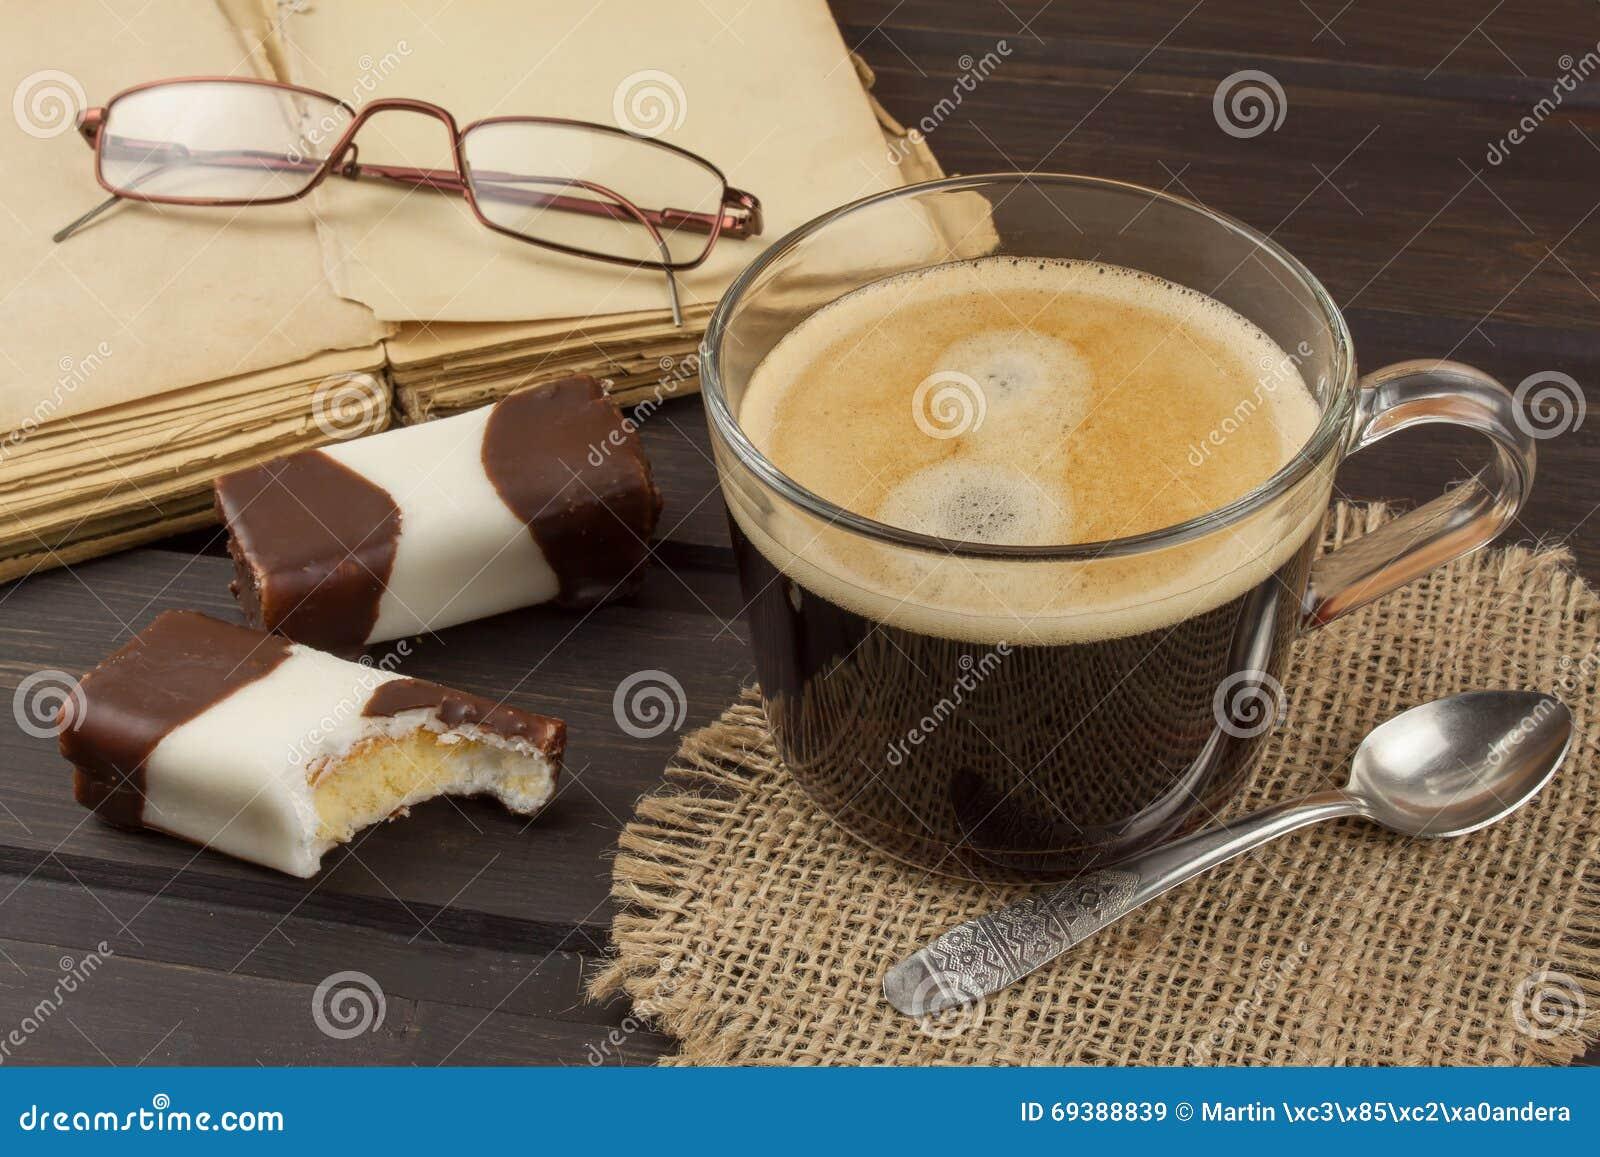 vieux livres eyewear et tasse de caf sur une table en. Black Bedroom Furniture Sets. Home Design Ideas